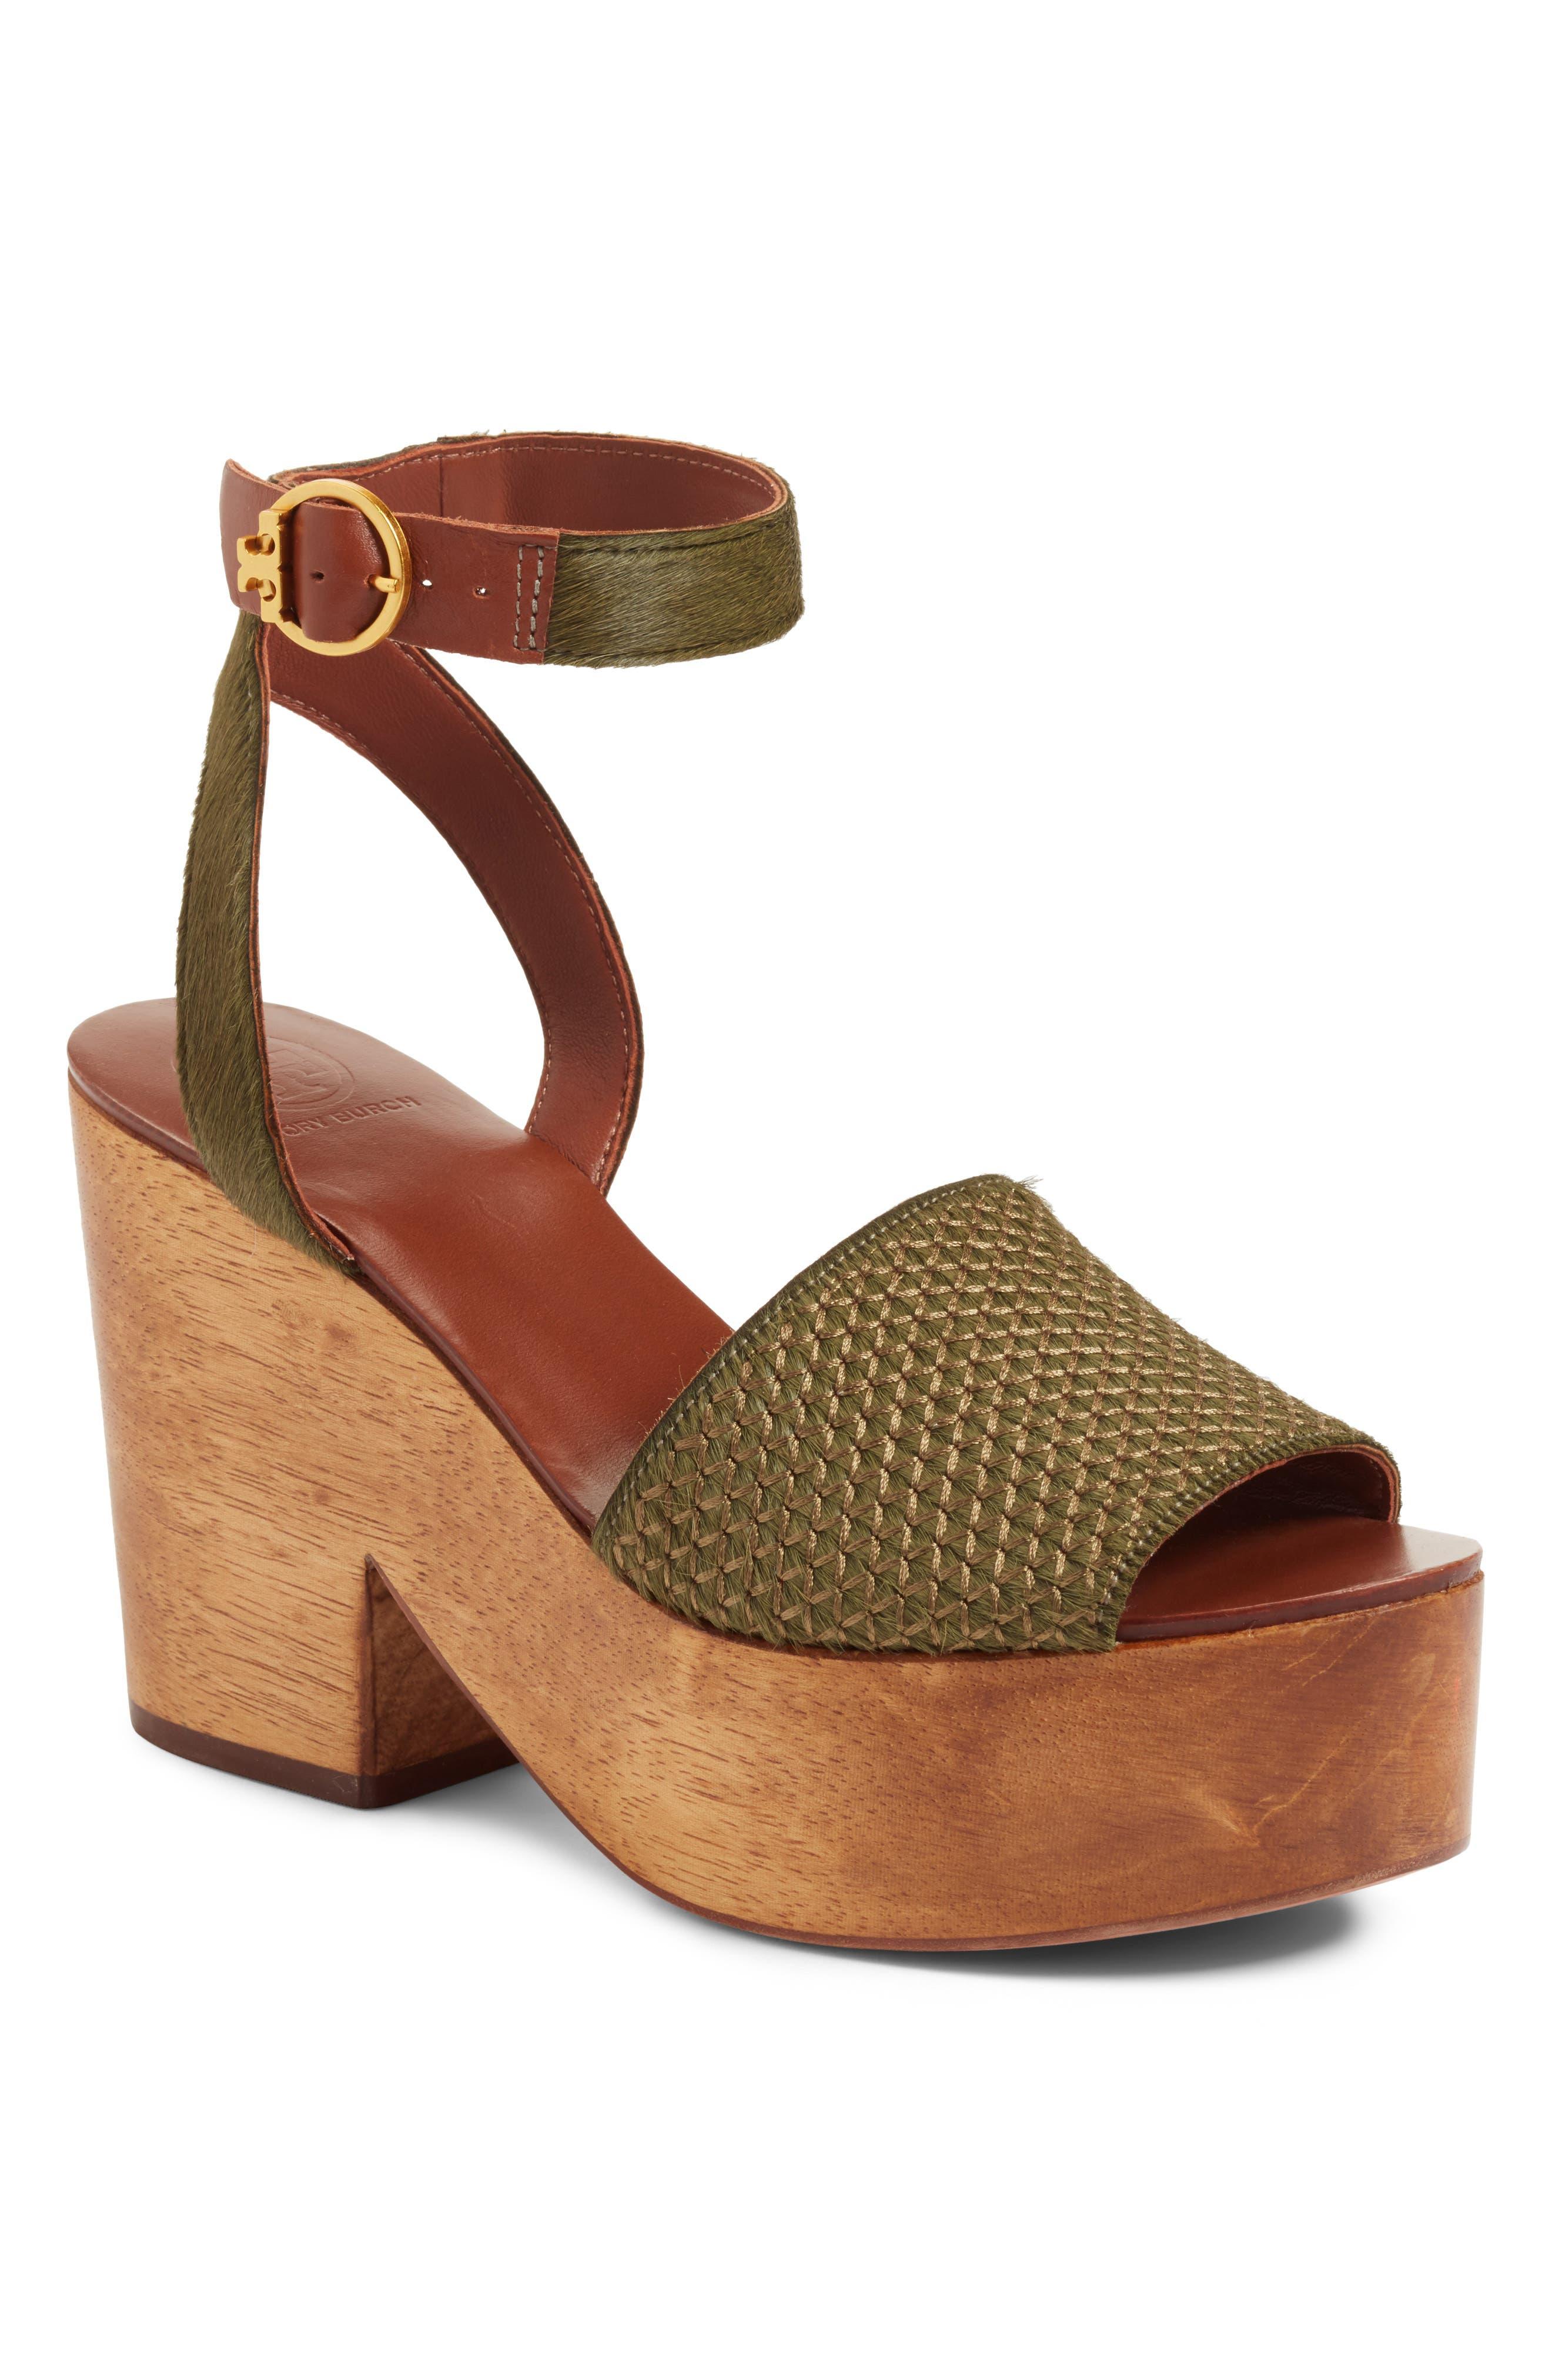 3d02845339c8 Tory Burch Camilla Genuine Calf Hair Platform Sandal In Olivo ...